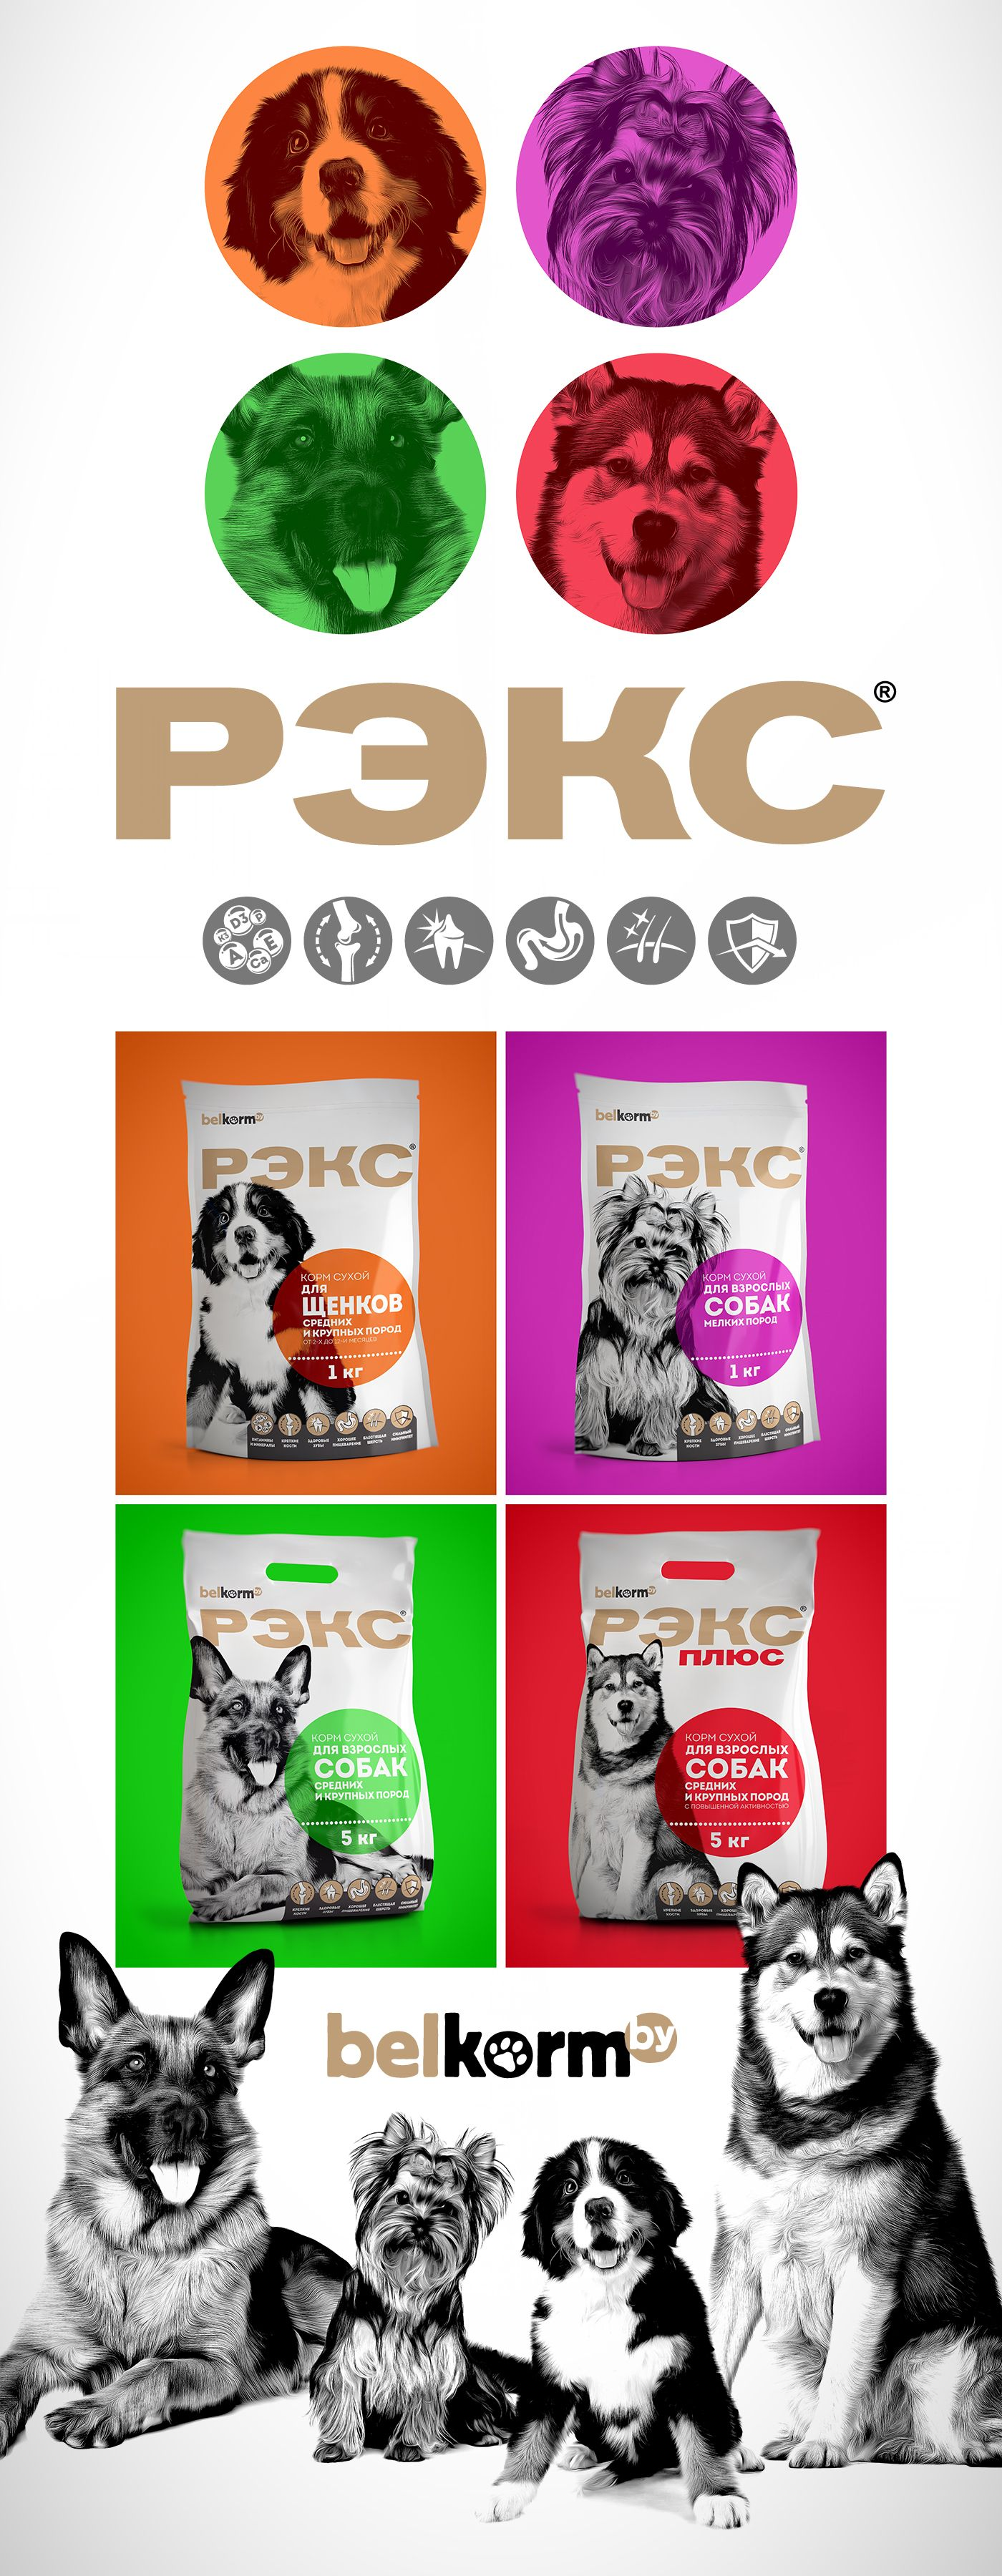 REX dog food packaging on Behance Dog food recipes, Food